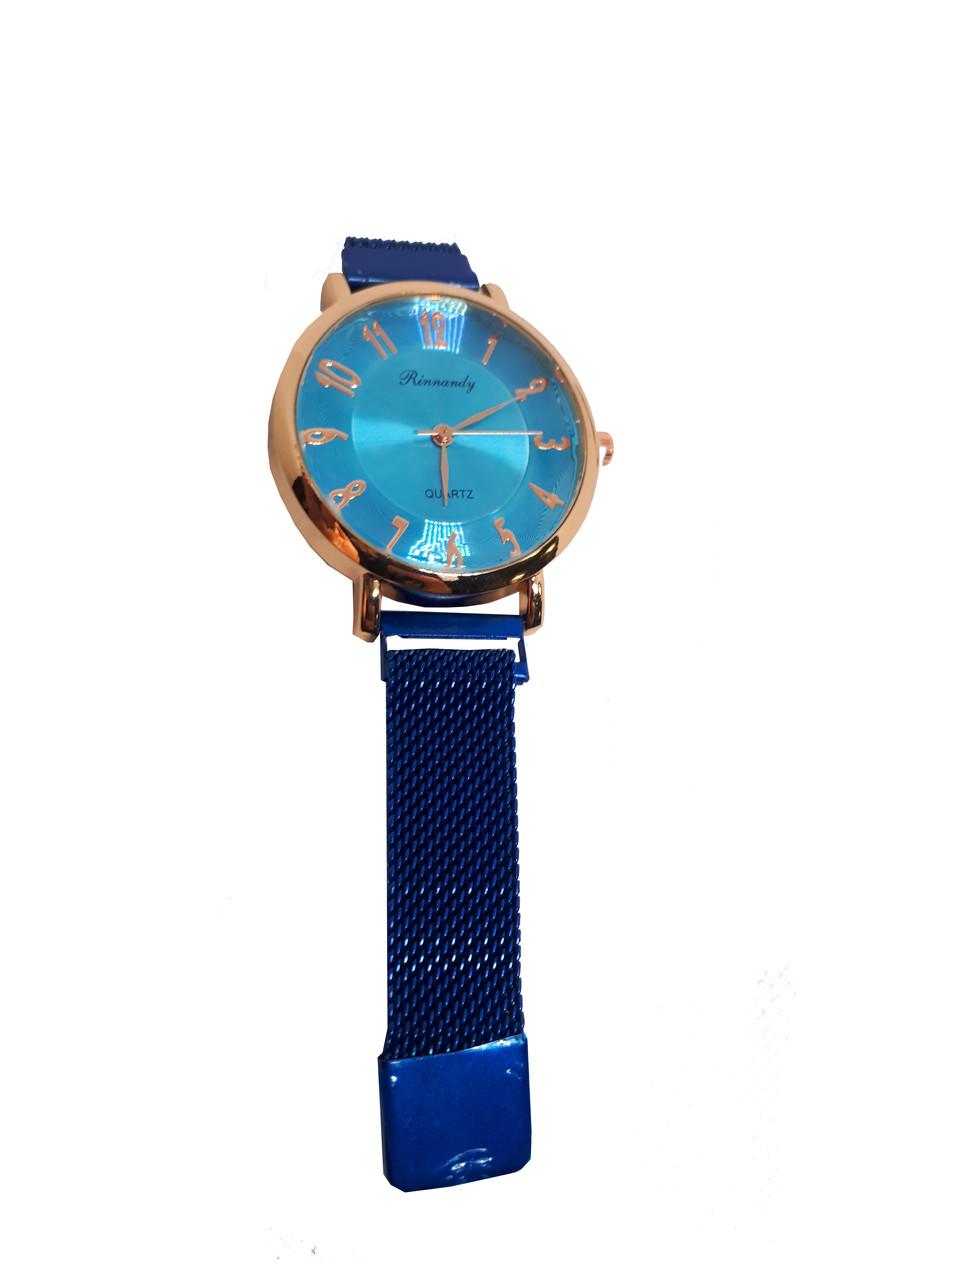 Часы кварцевые  Rinnady Arabi с камнями на  магнитном браслете . Синий.